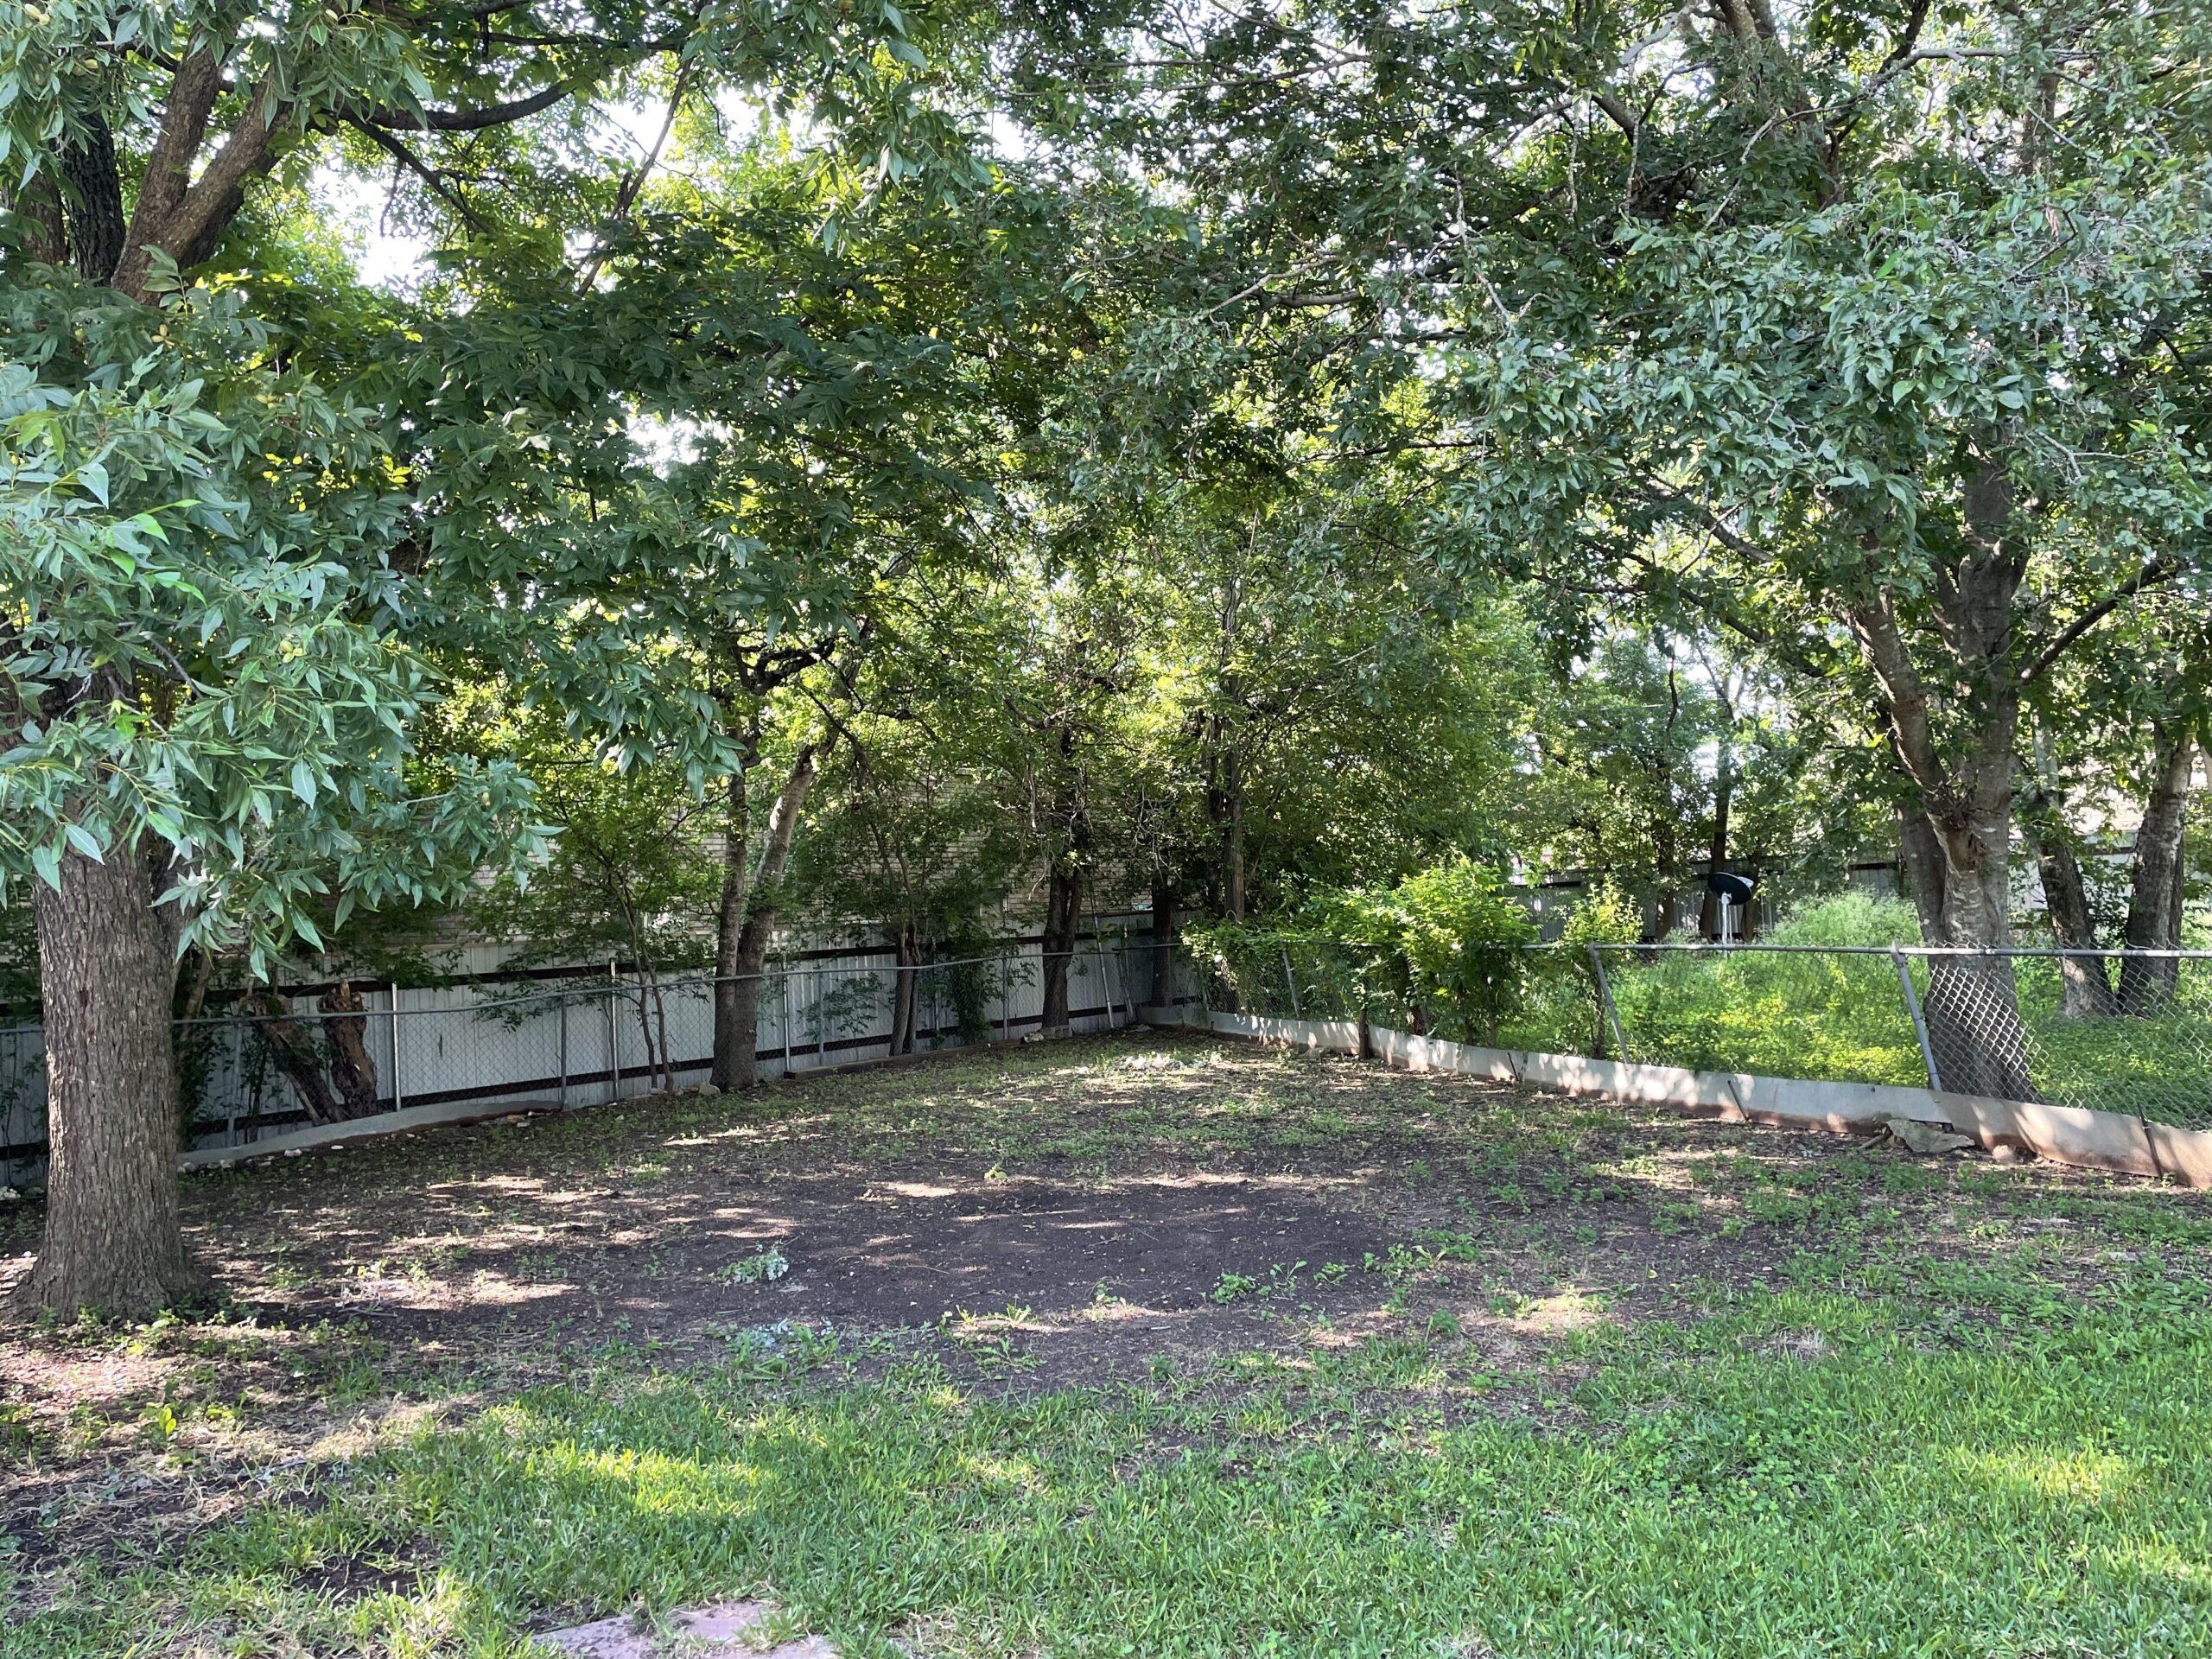 1206 Sissom - Back yard